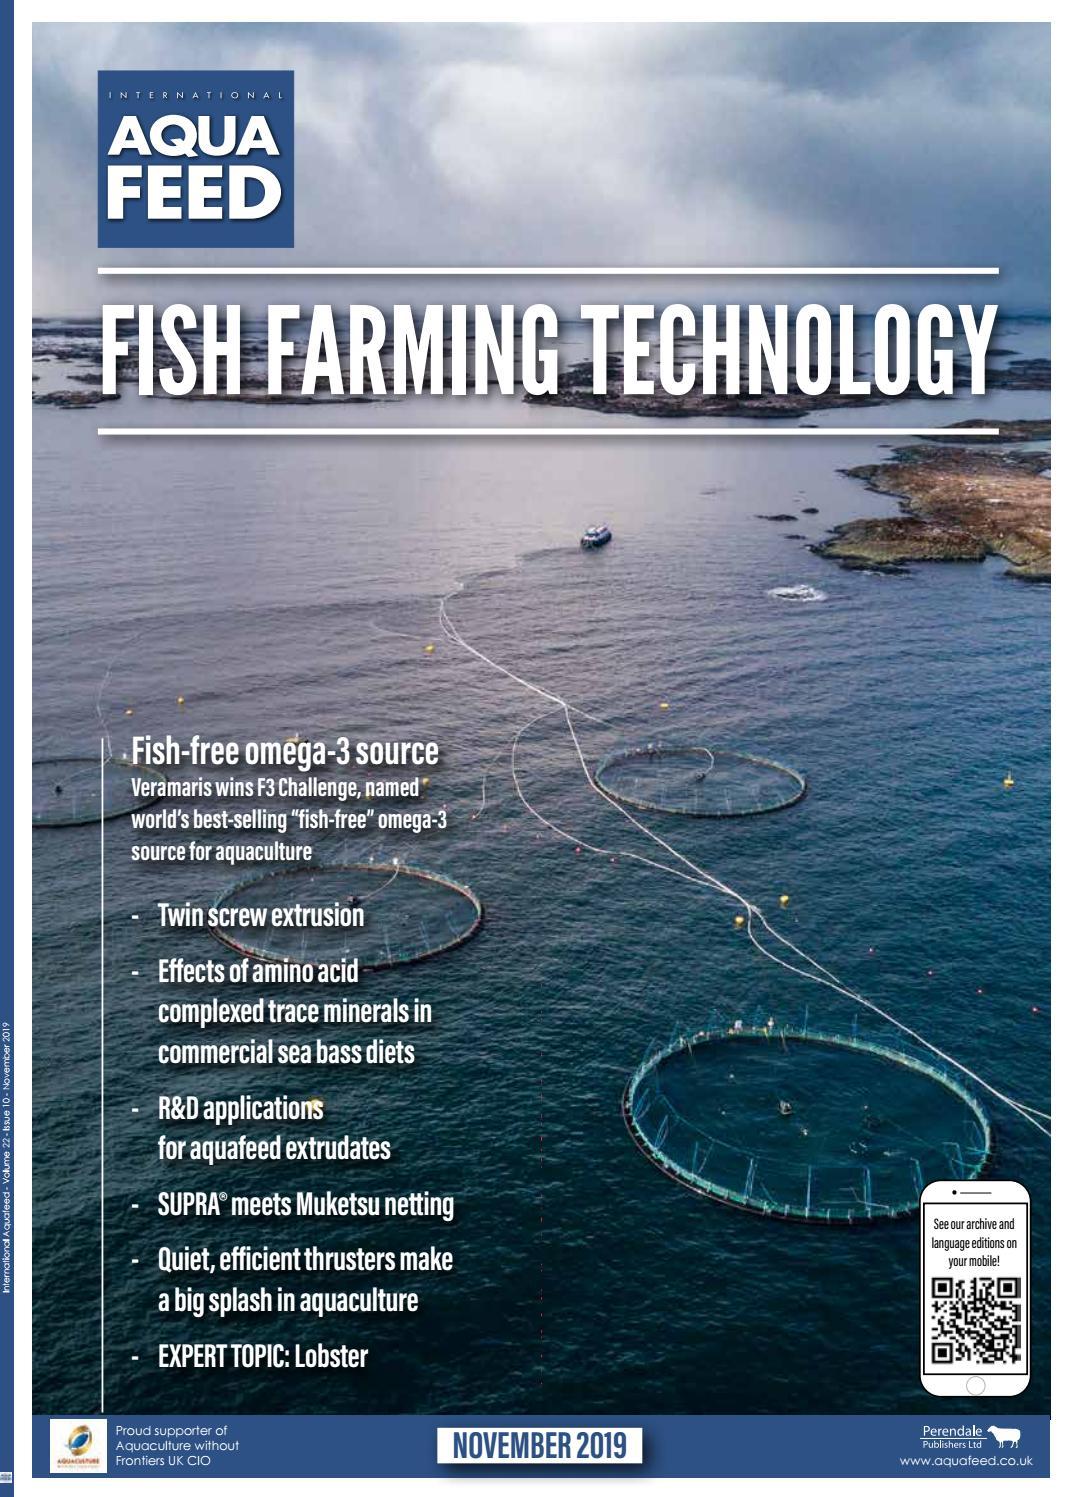 Nov 2019 International Aquafeed Magazine By Perendale Publishers Ltd Issuu